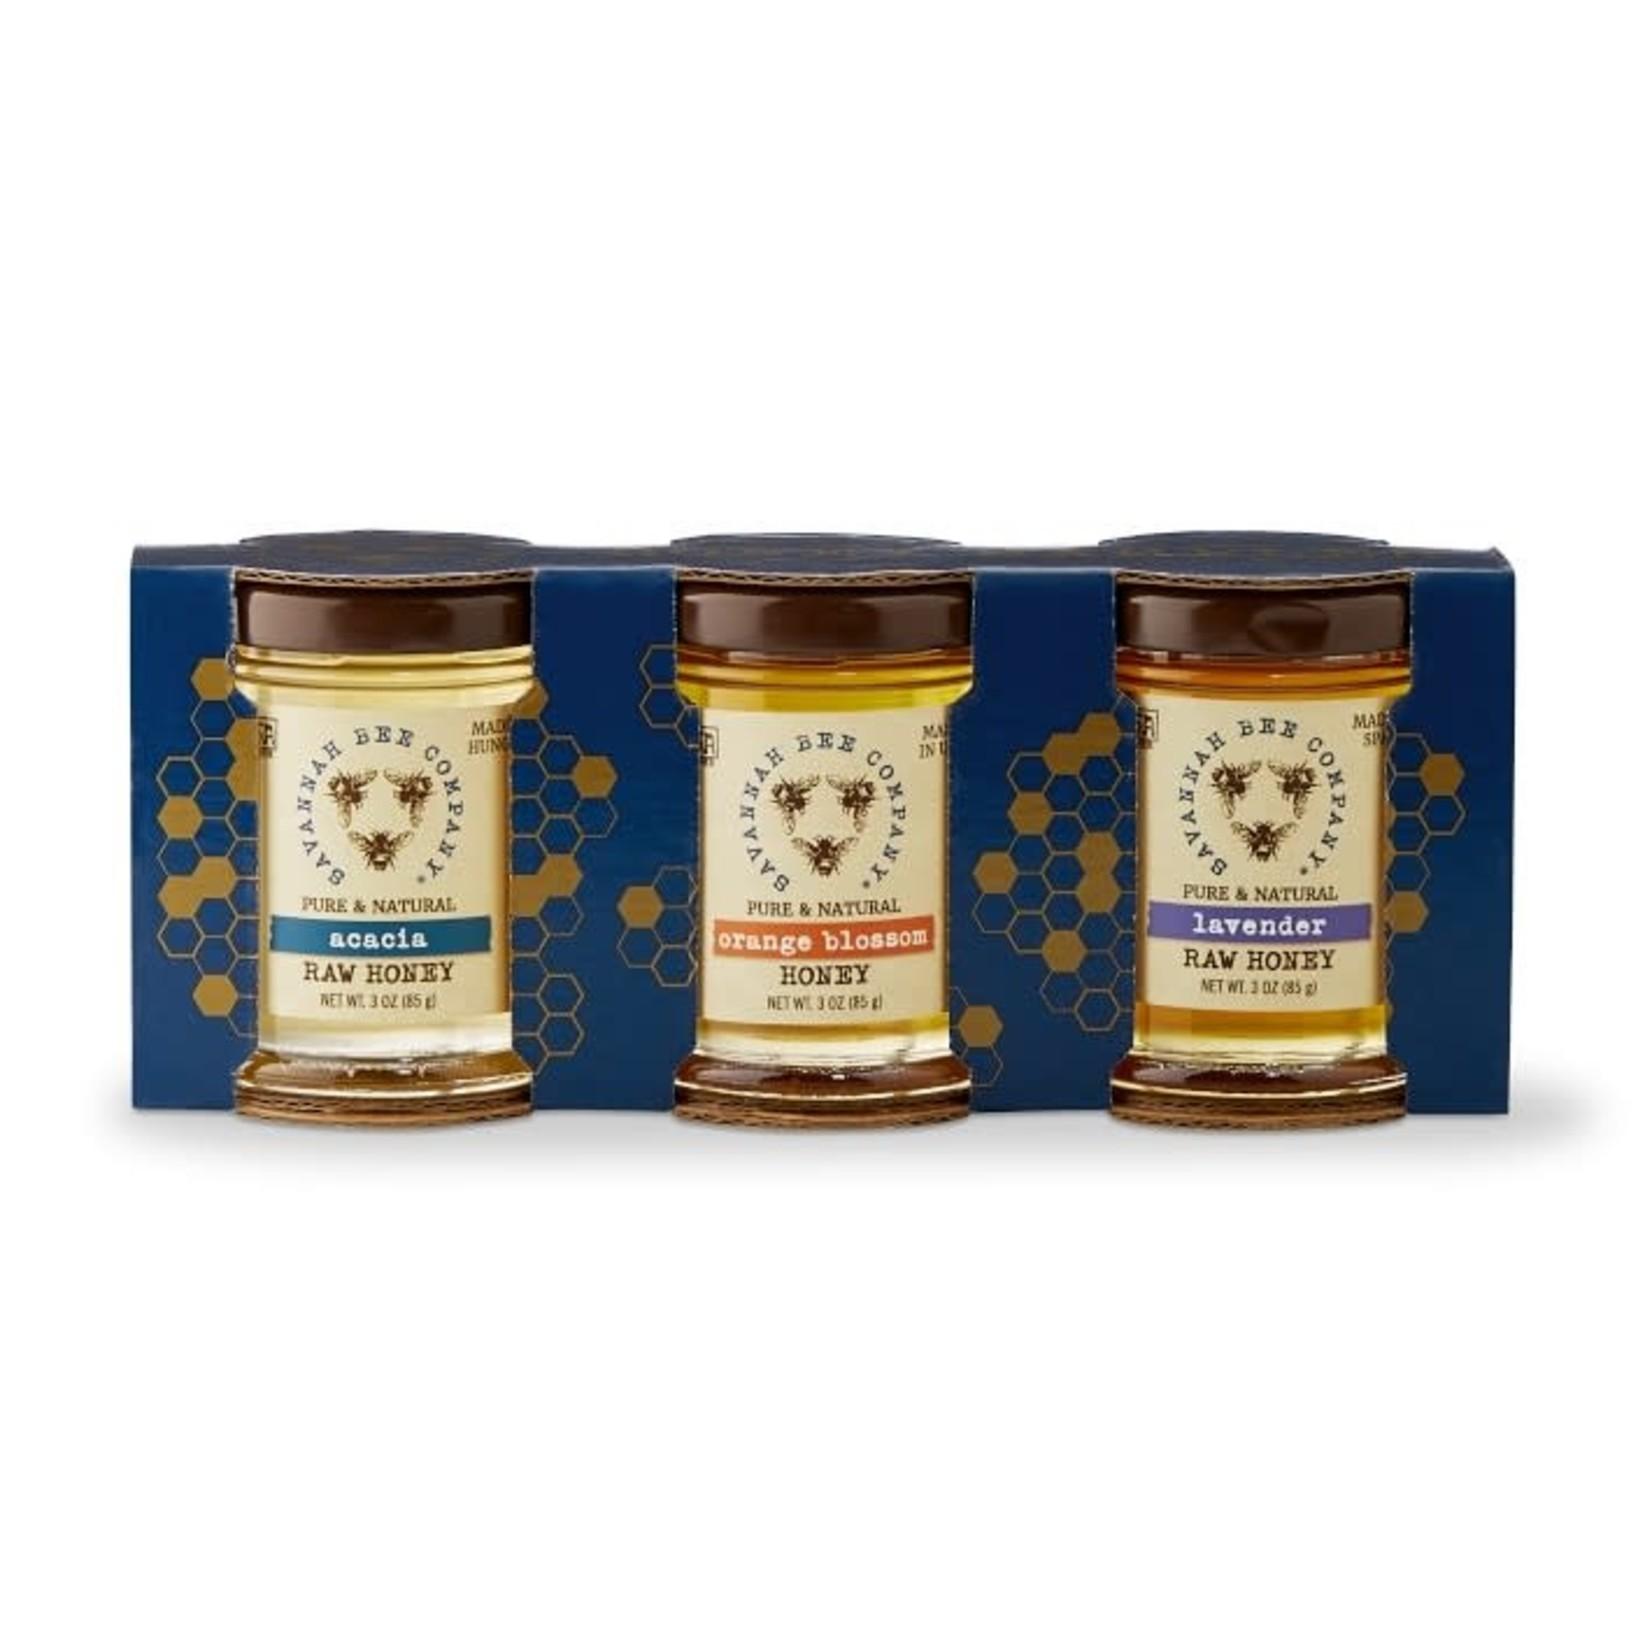 Savannah Bee Company Artisanal Honey Sampler